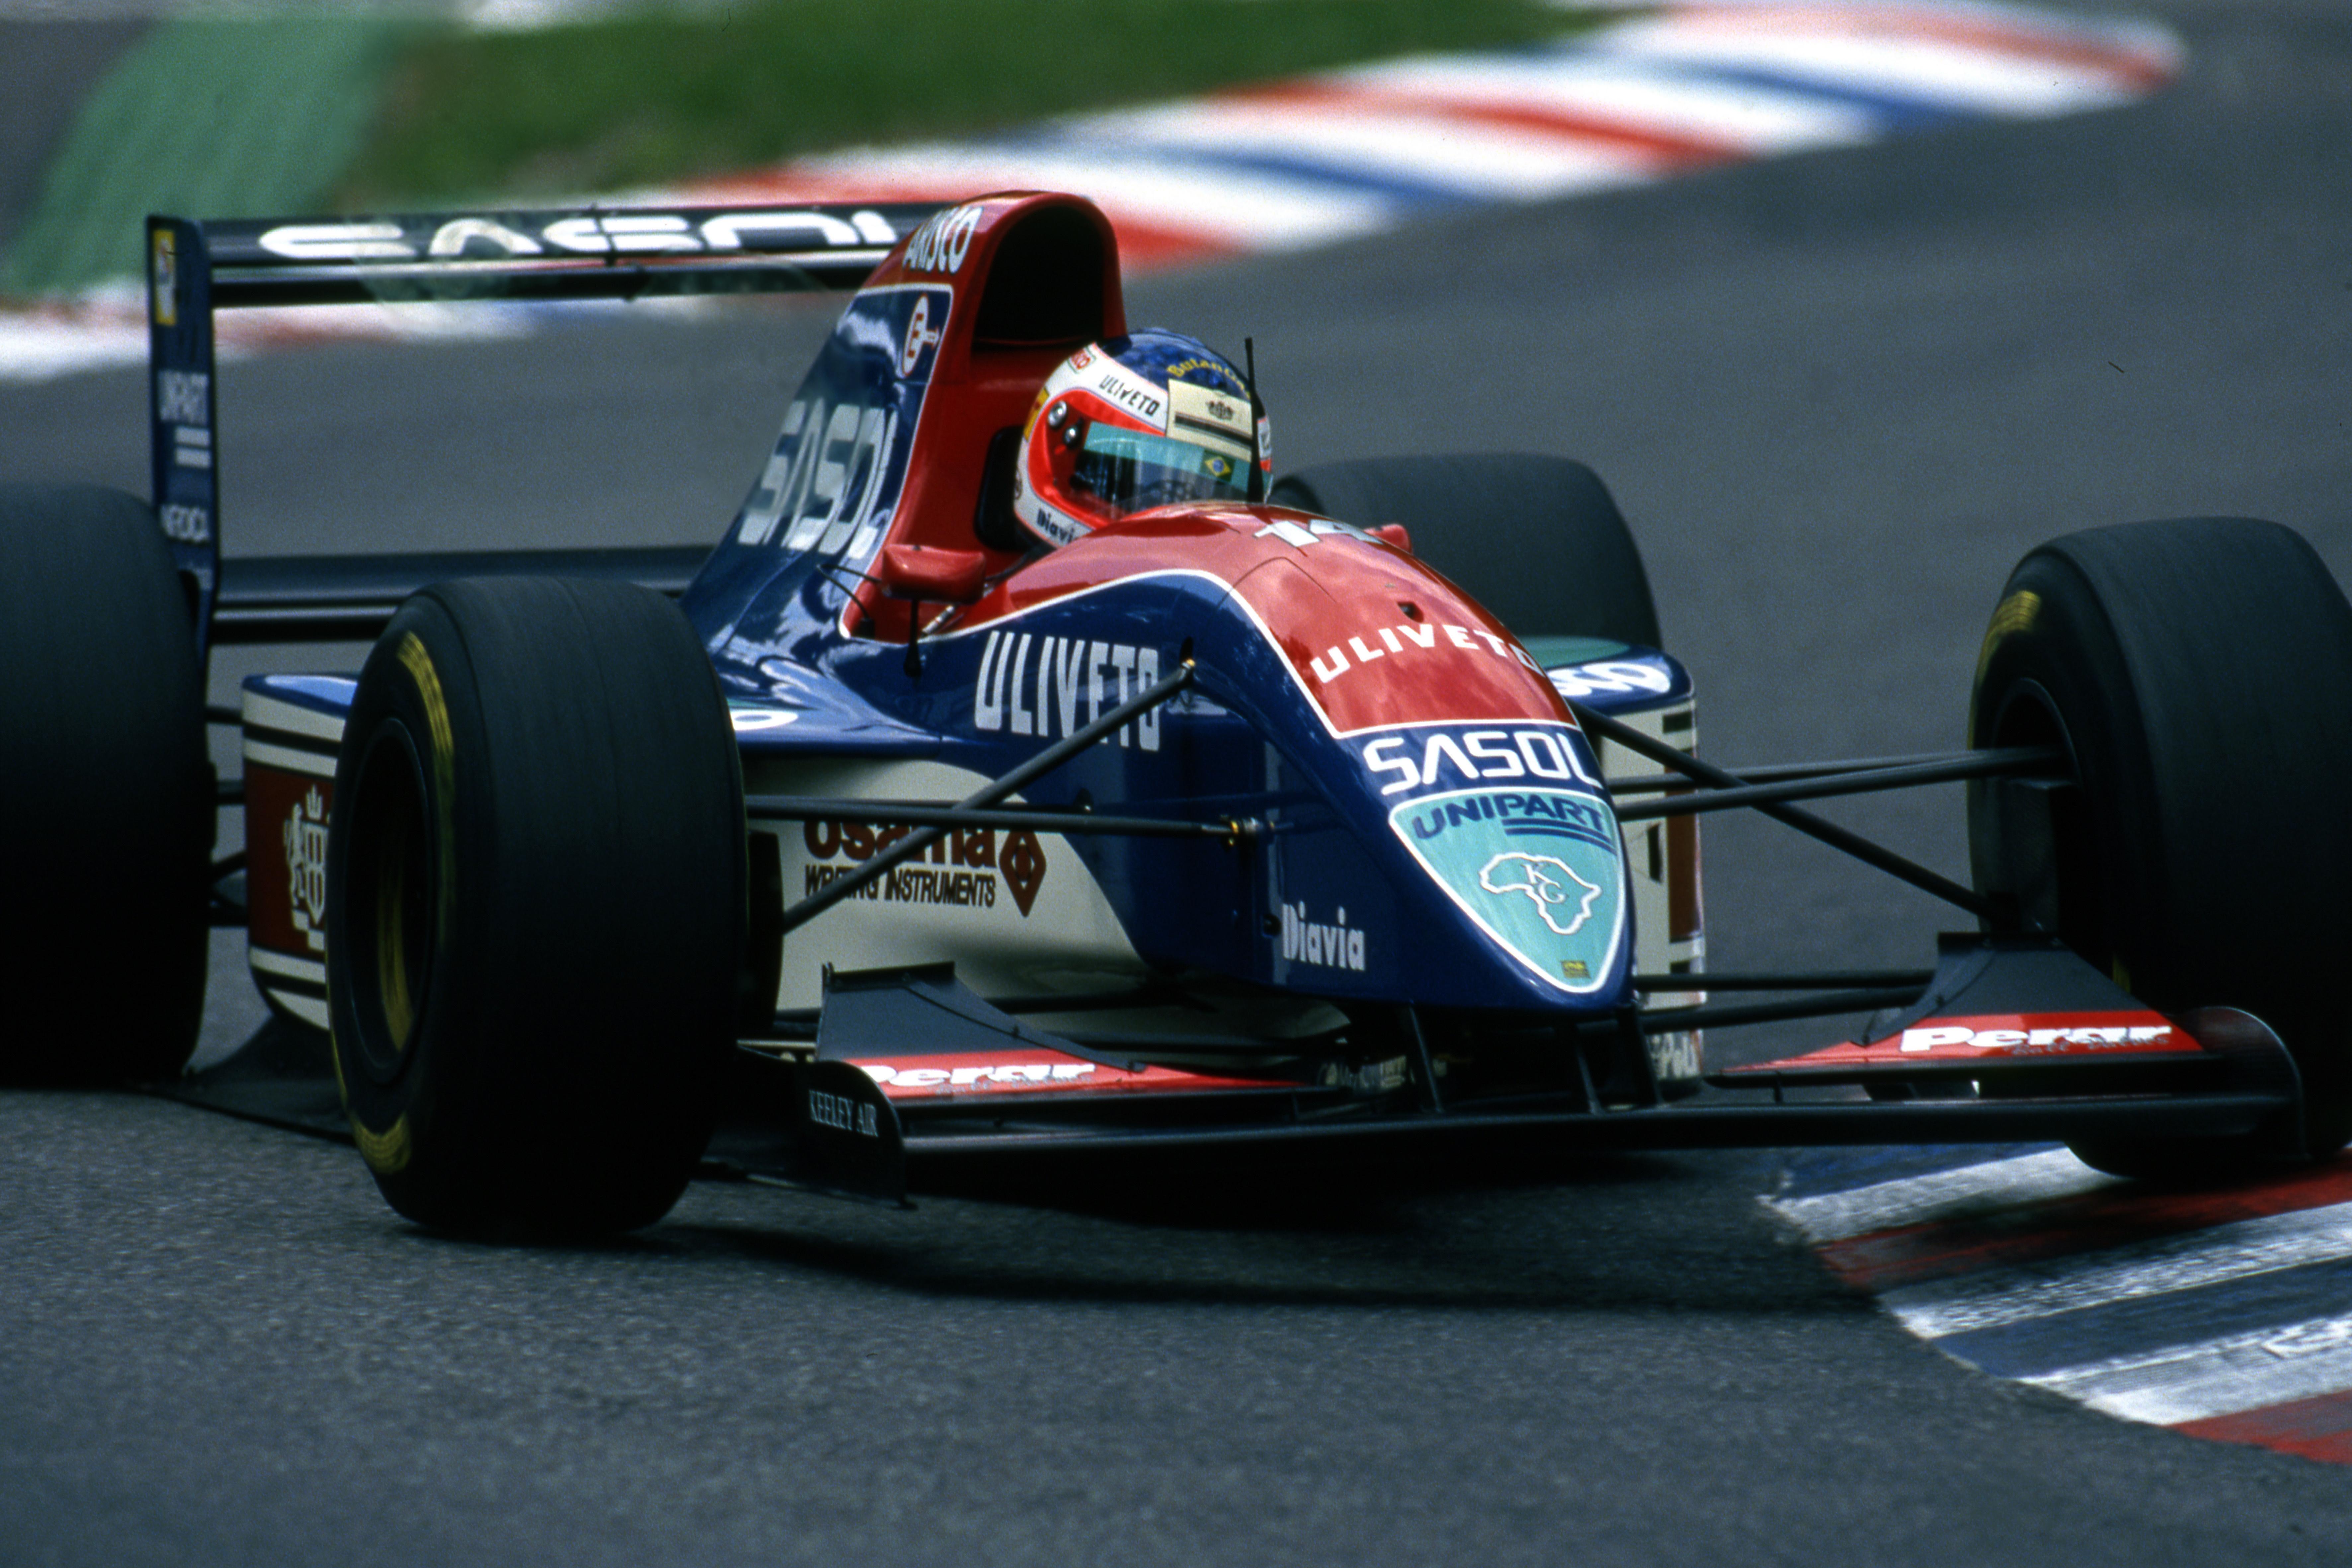 Rubens Barrichello Jordan 1993